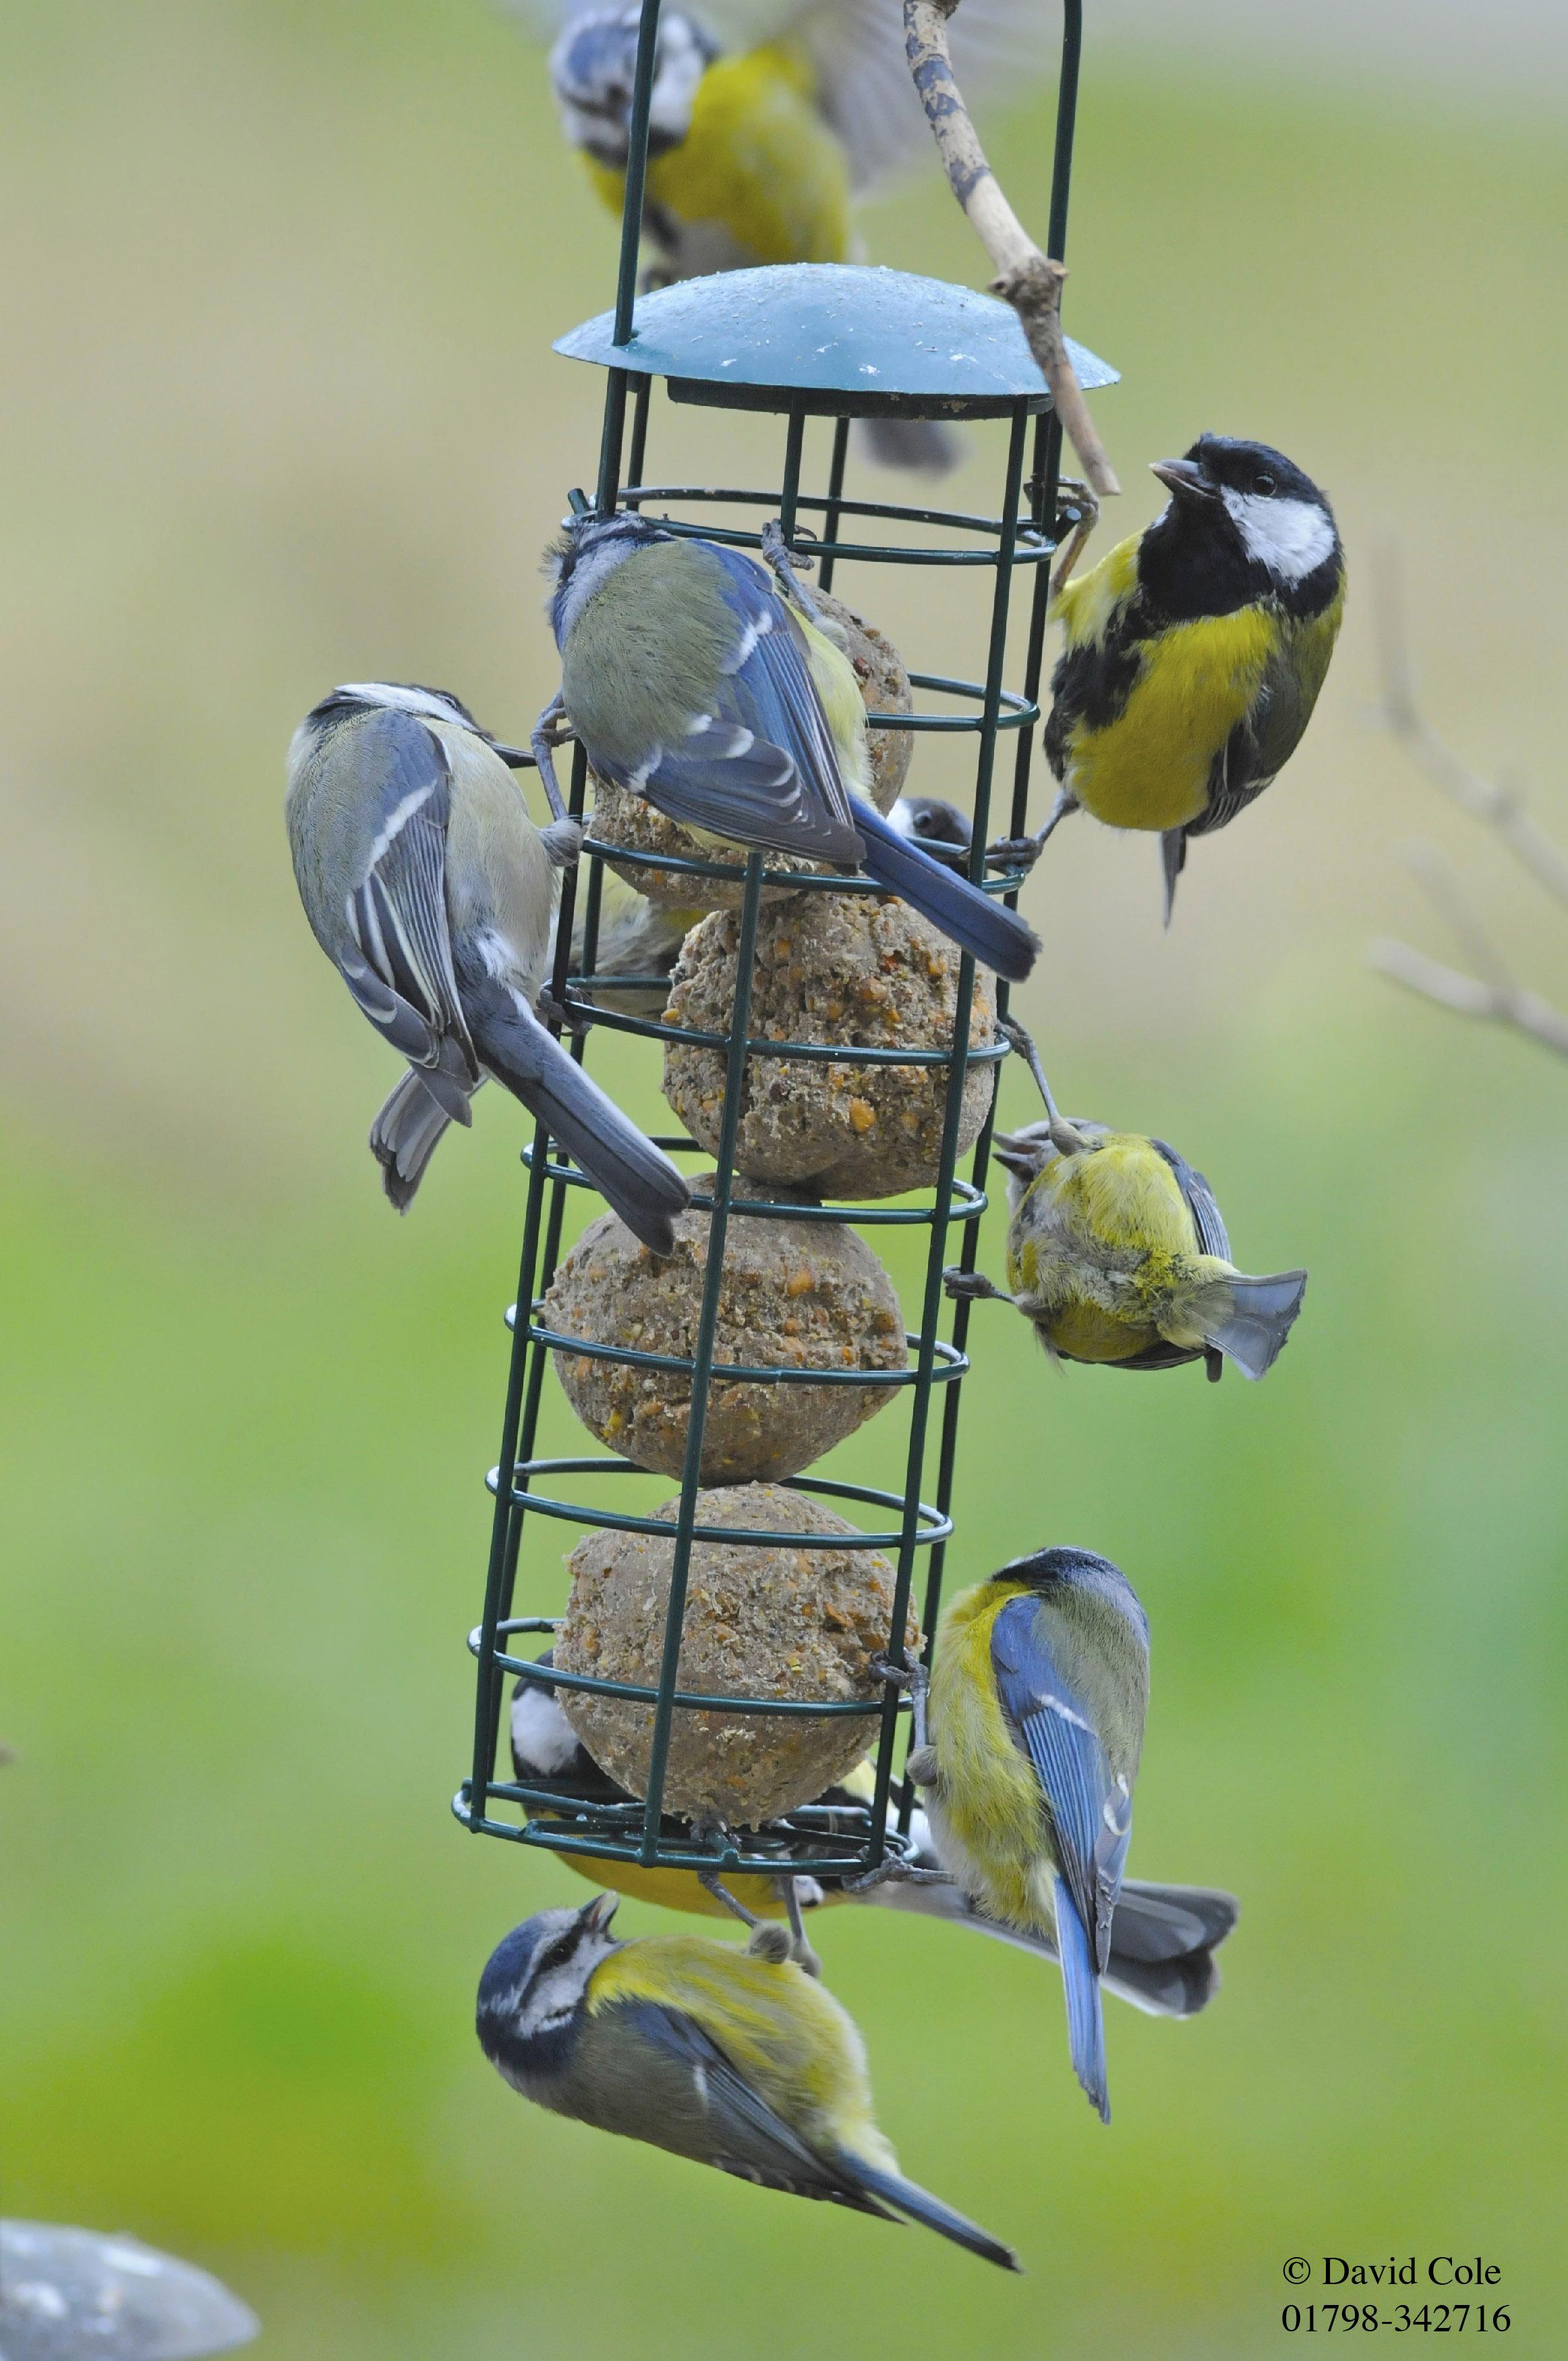 bird many defeated they problems feeding wild be small birds feeder can birdfeedingproblems but for all